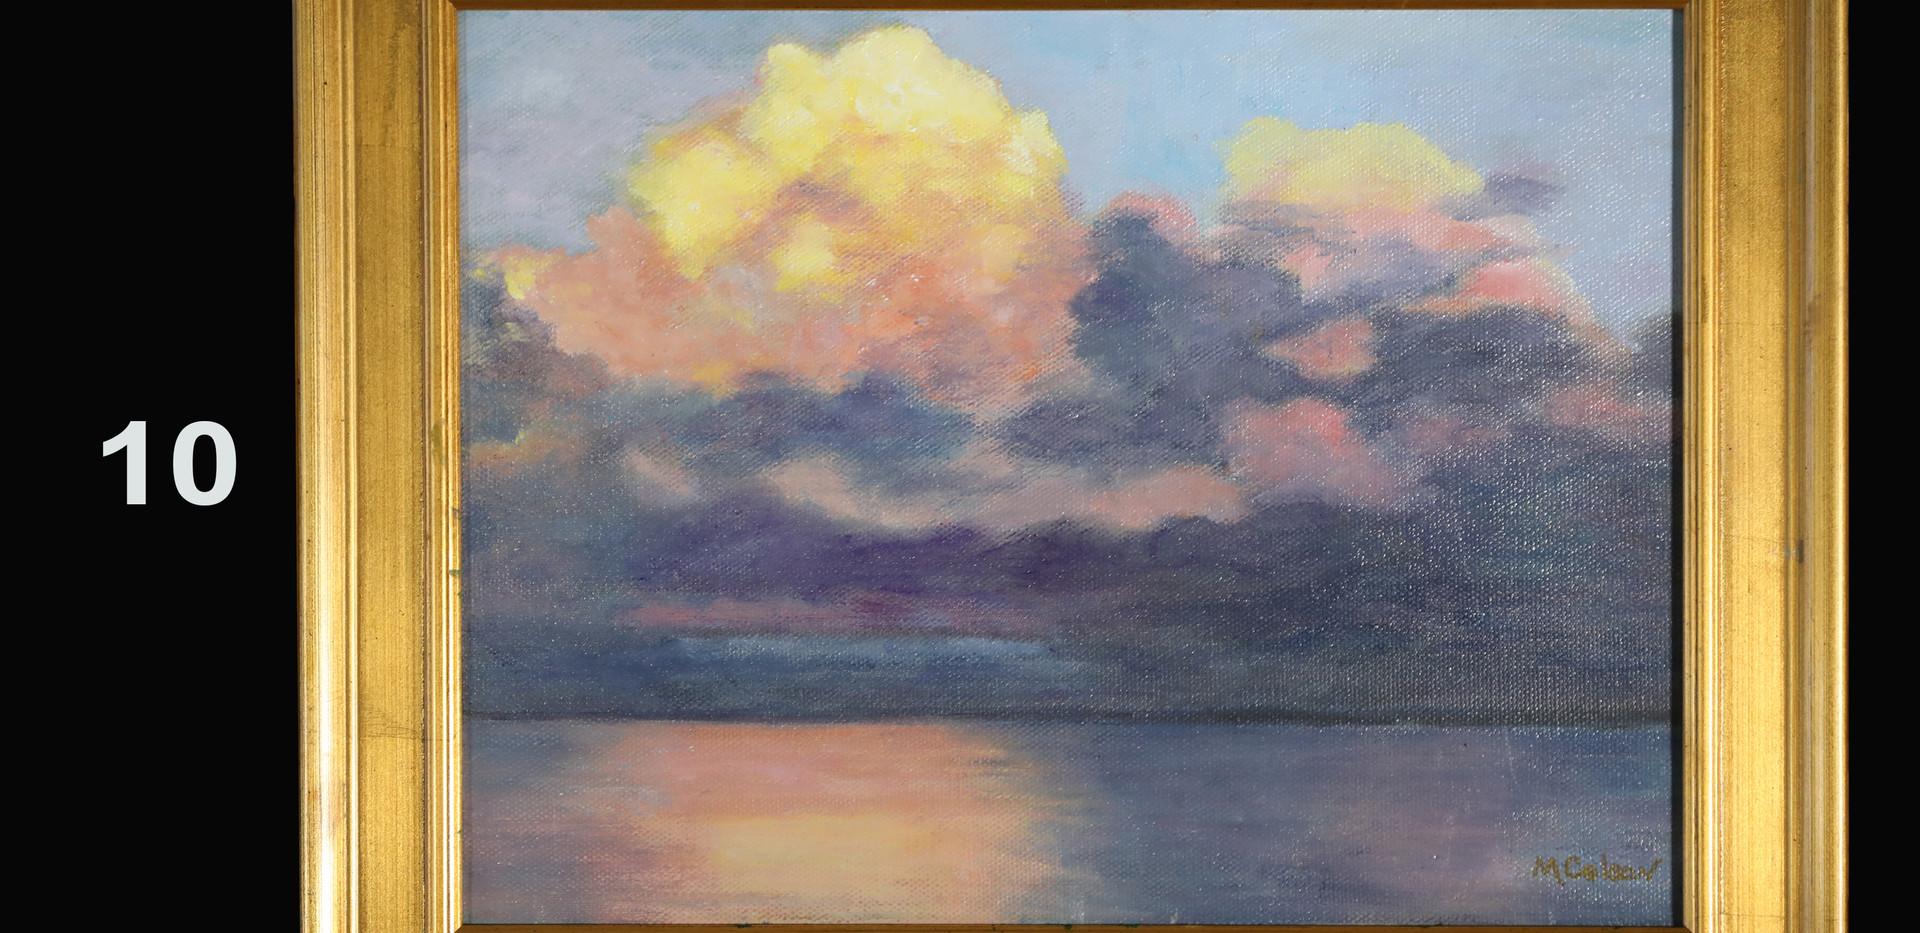 10. Orange Beach Sunset